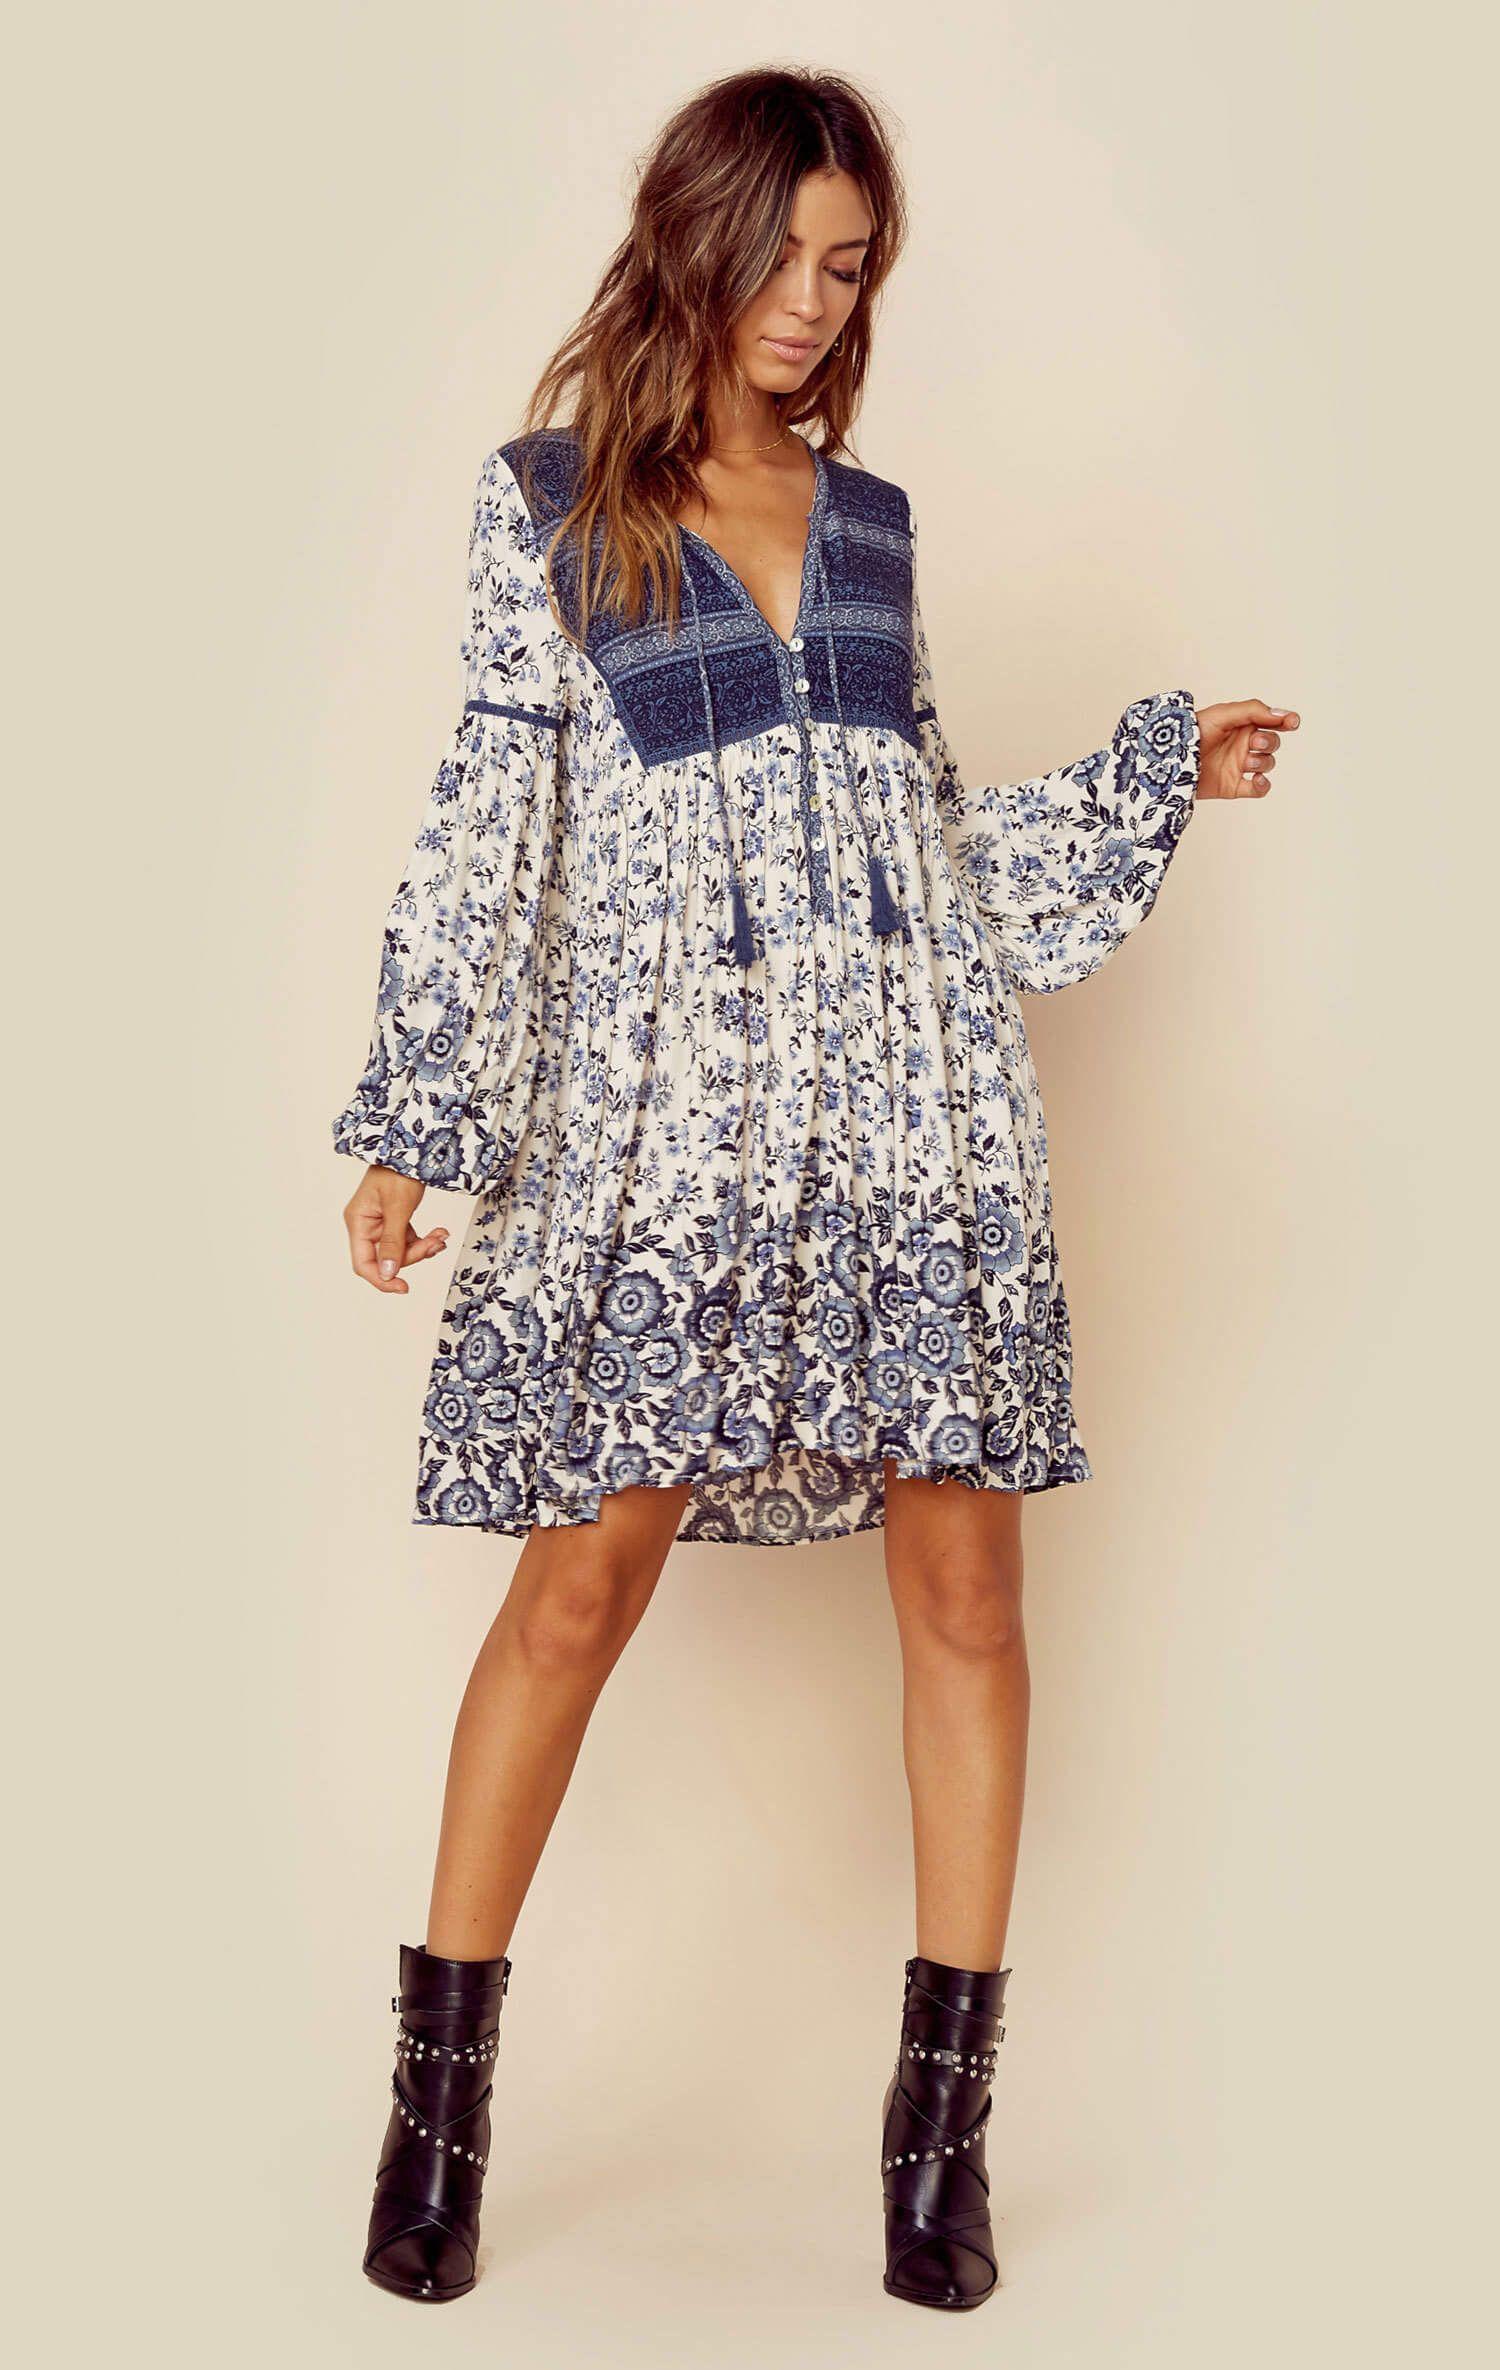 8f7e69d69d3e5 Hippie Chic Fashion, Boho Chic, Bohemian Print, Fashion 2018 Trends,  Paisley Dress